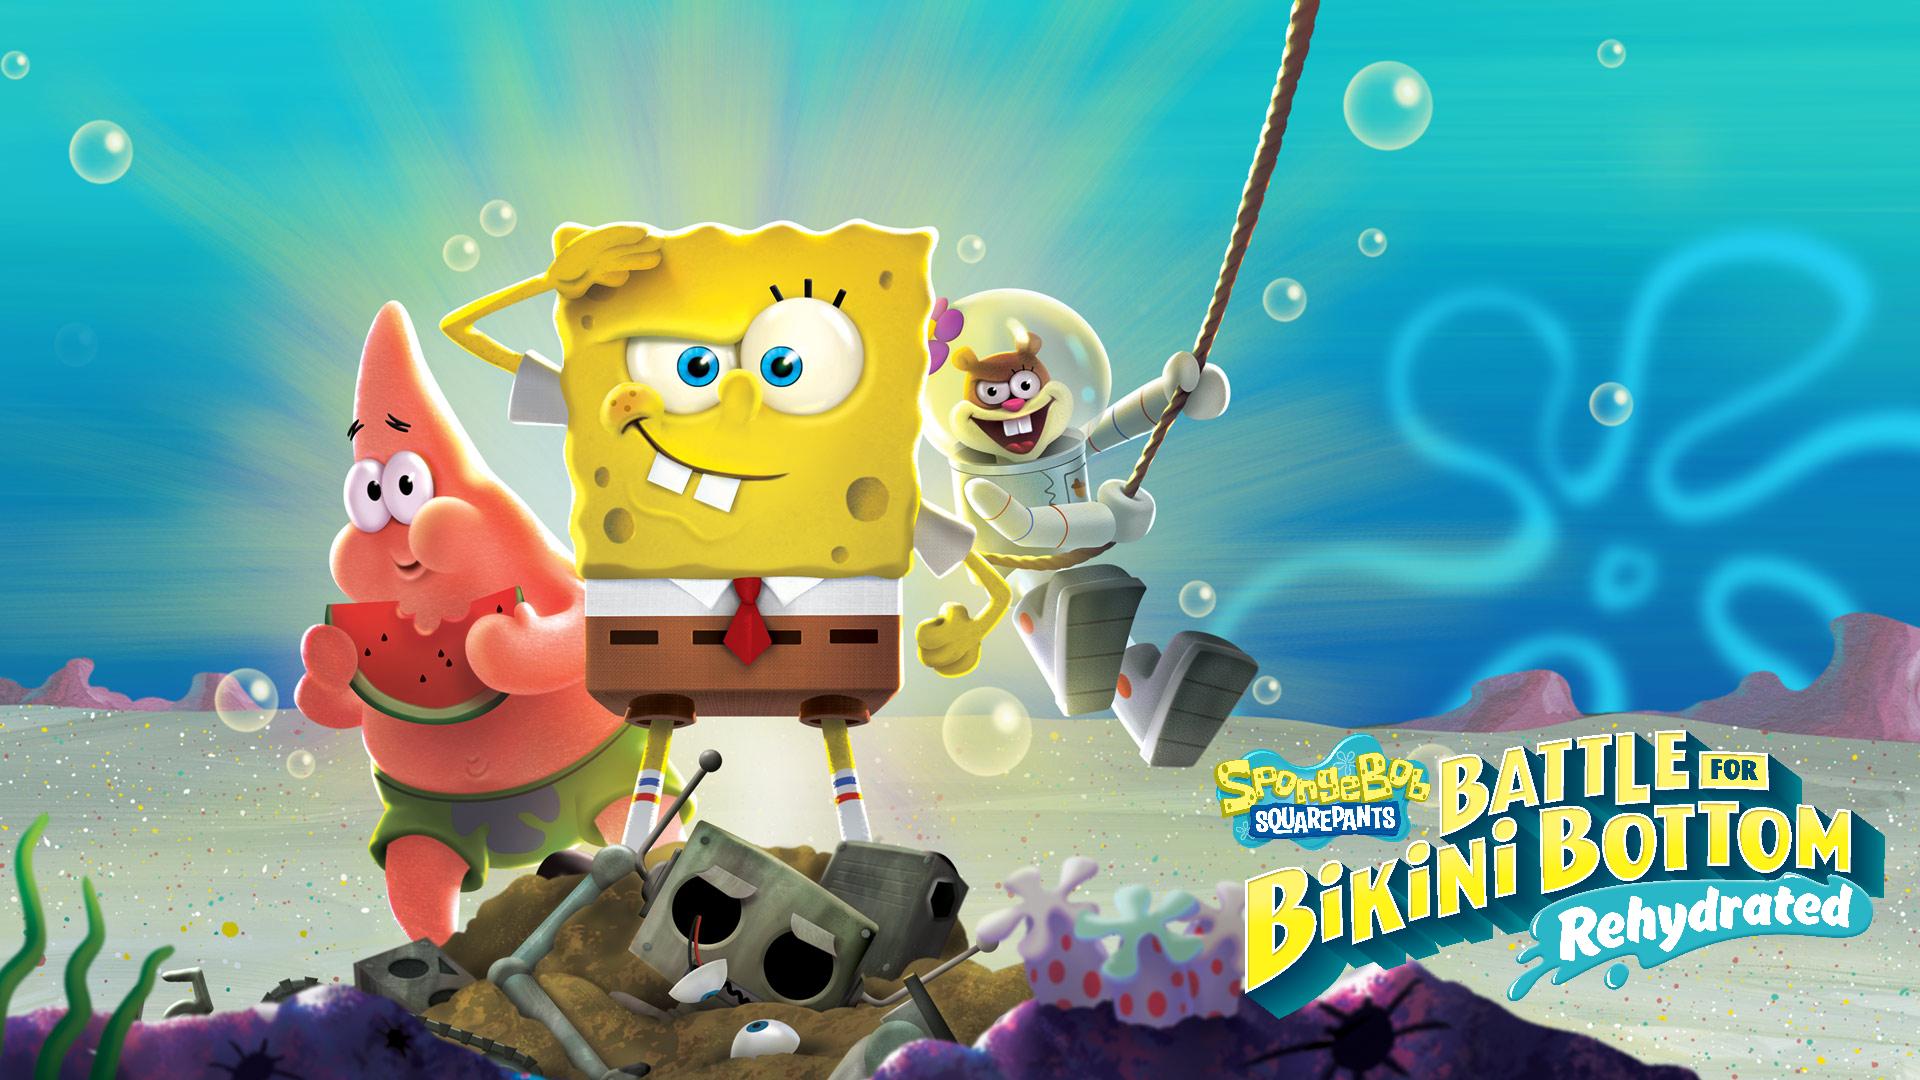 Spongebob Squarepants Rehydrated